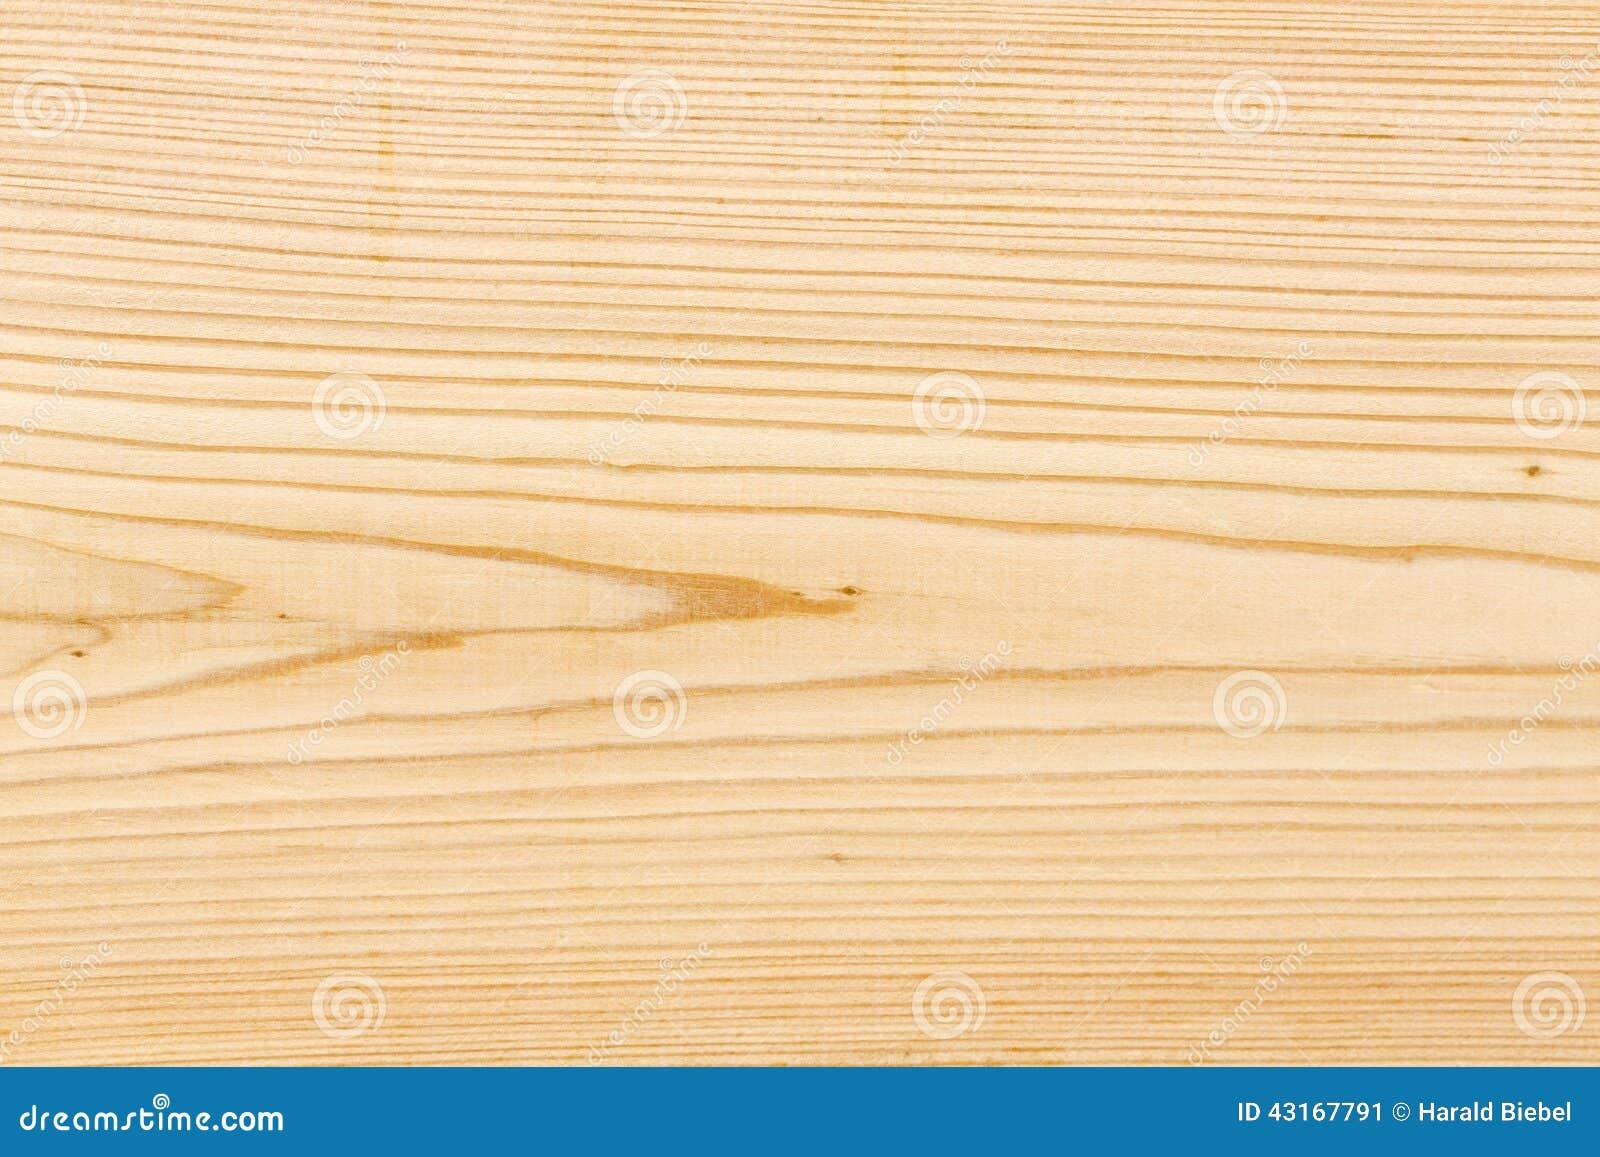 l rchenholz als hintergrund stockfoto bild 43167791. Black Bedroom Furniture Sets. Home Design Ideas